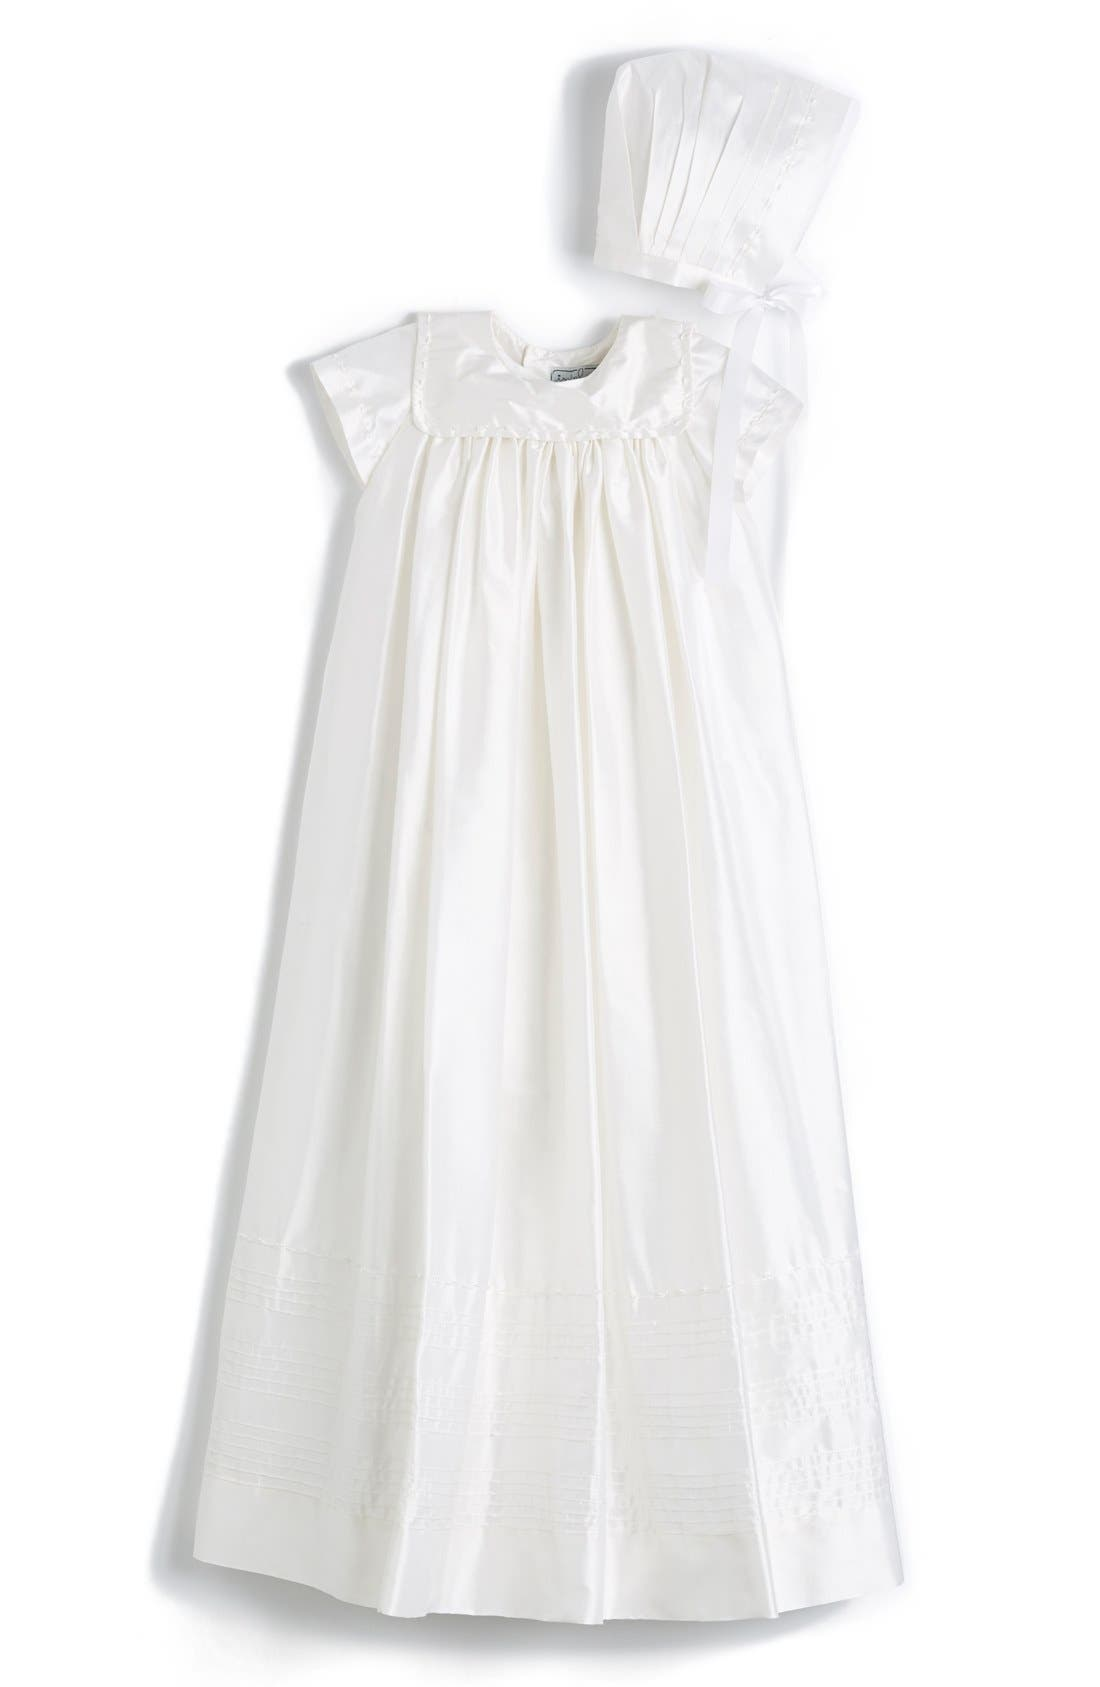 Main Image - Isabel Garreton 'Traditional' Silk Christening Gown & Bonnet (Baby)